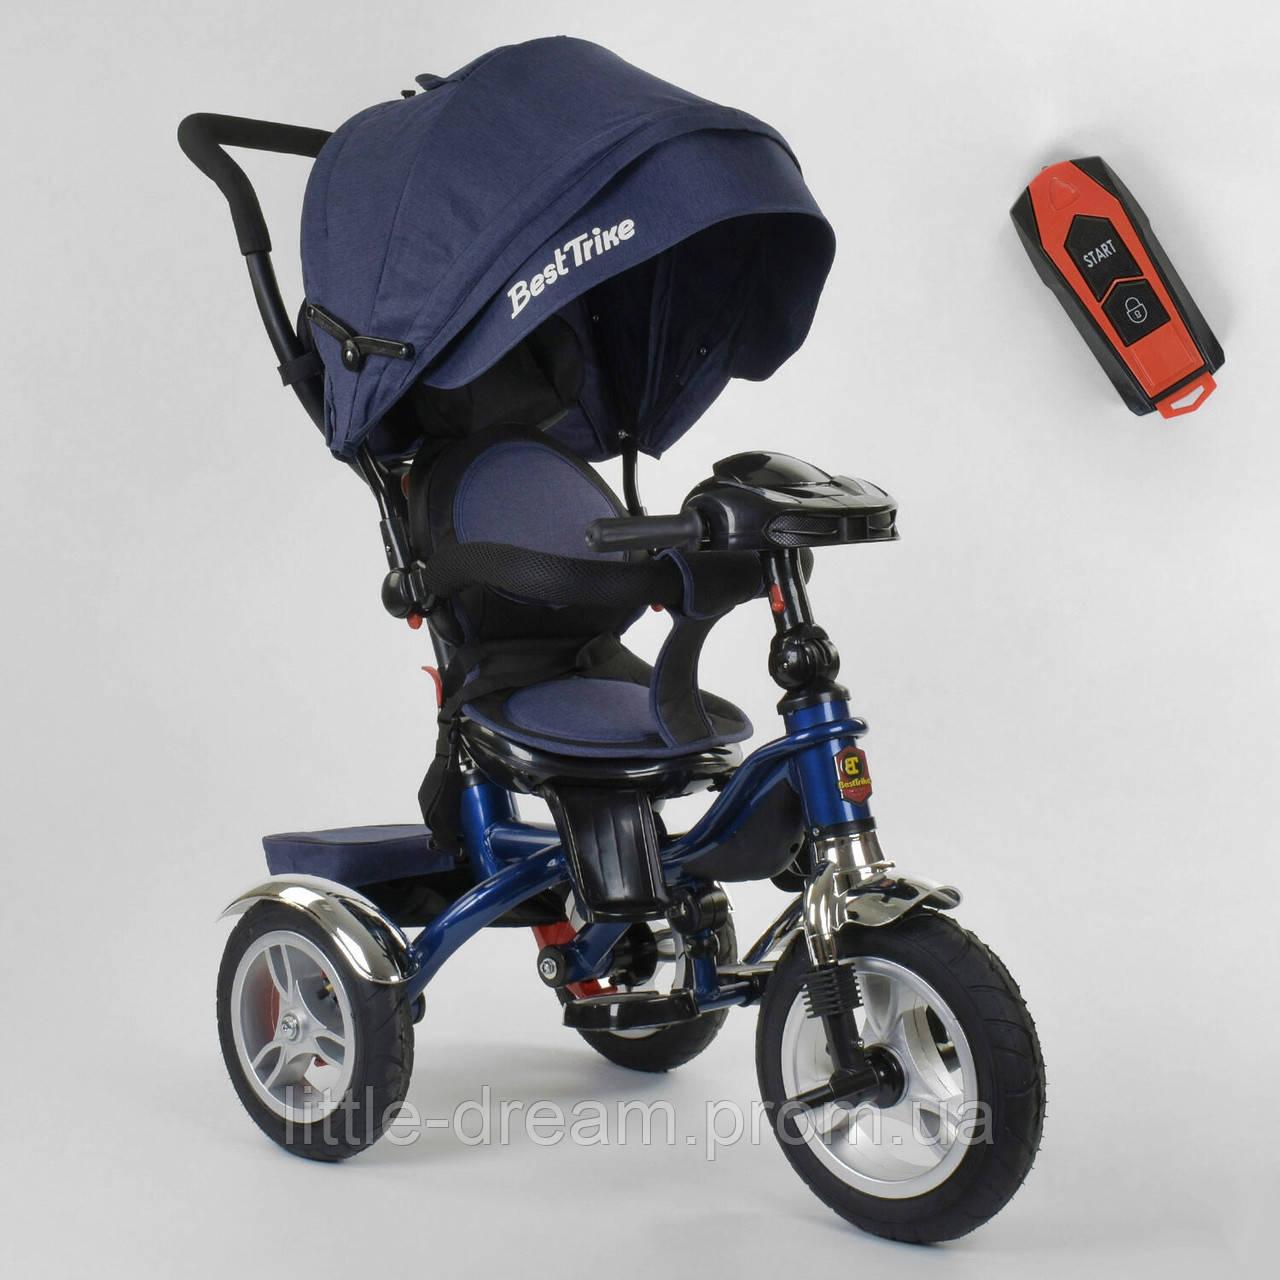 Трехколесный велосипед Best Trike 5890 / 83-067 Синий